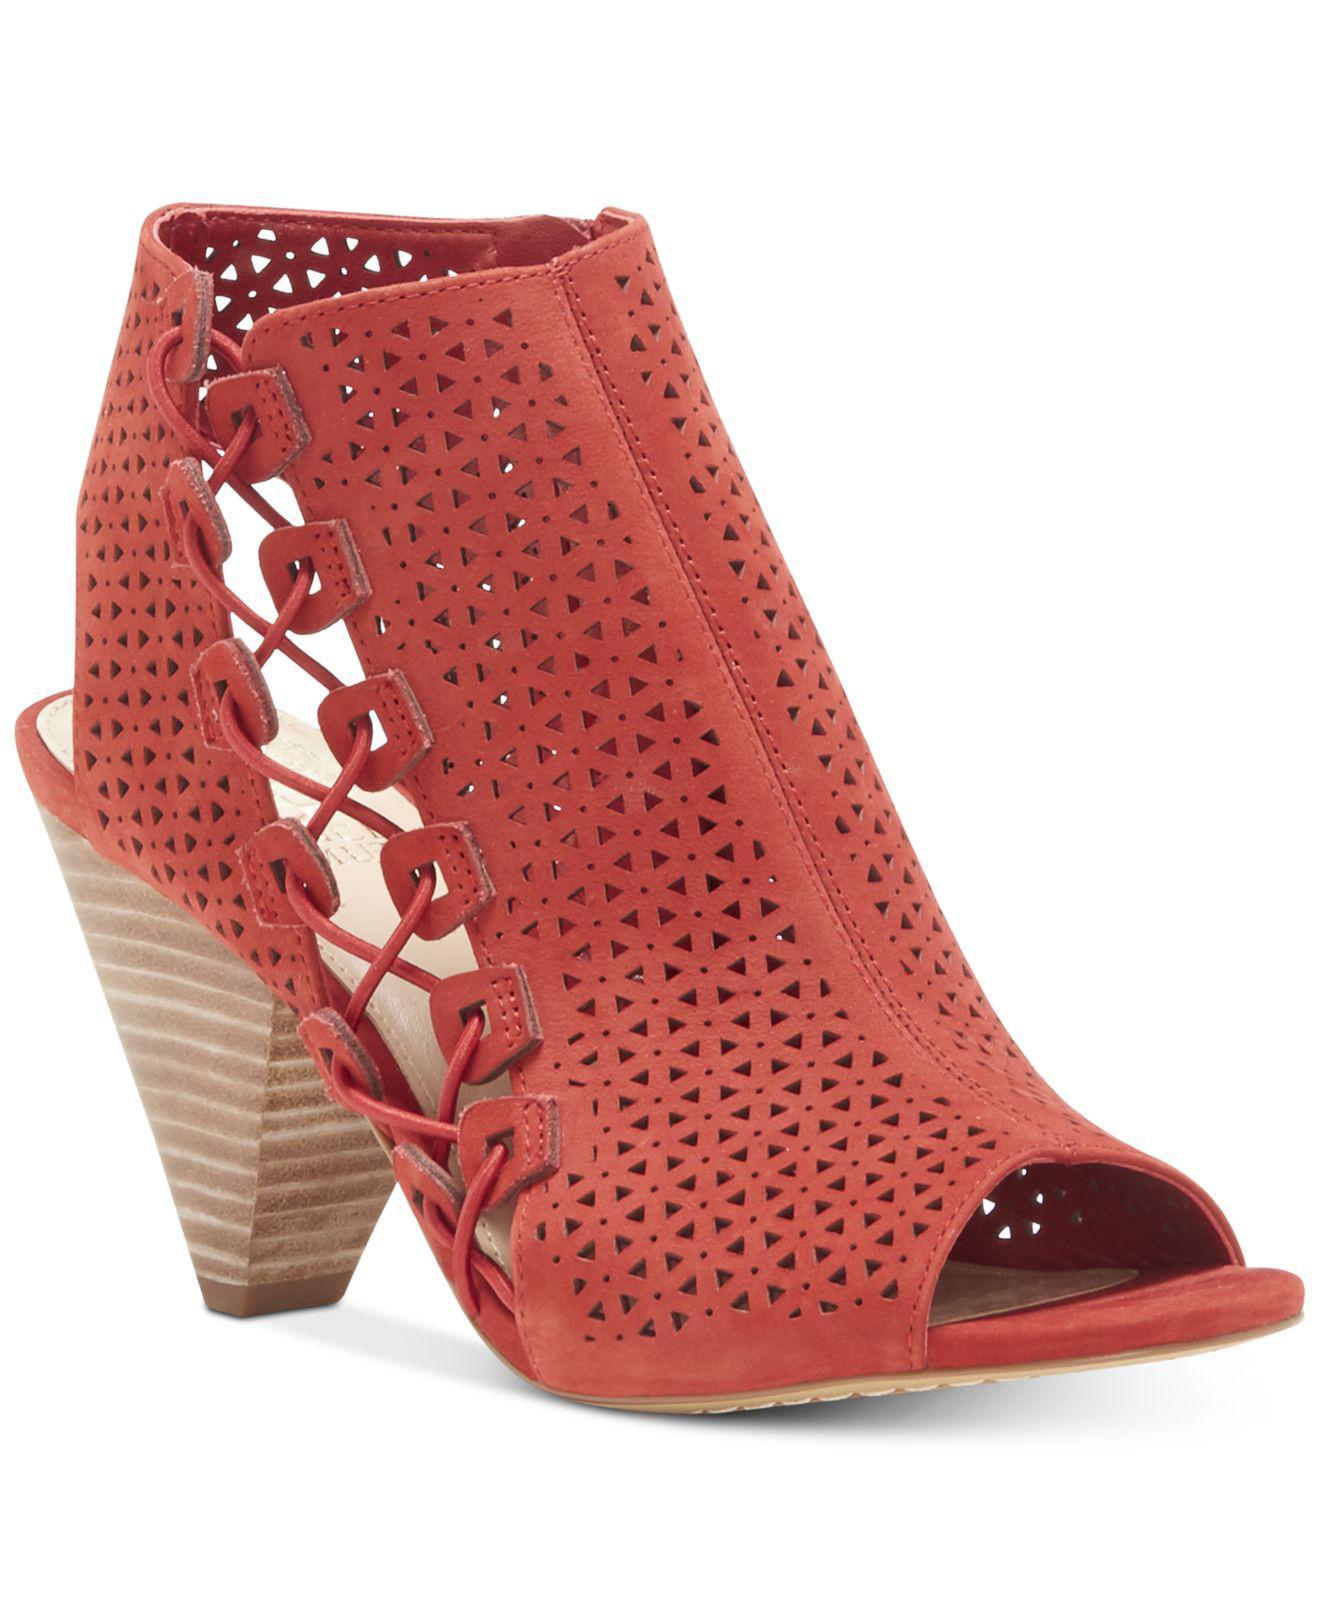 Vince Camuto Elison Cone-Heel Dress Sandals Women's Shoes 8wiDwgtc